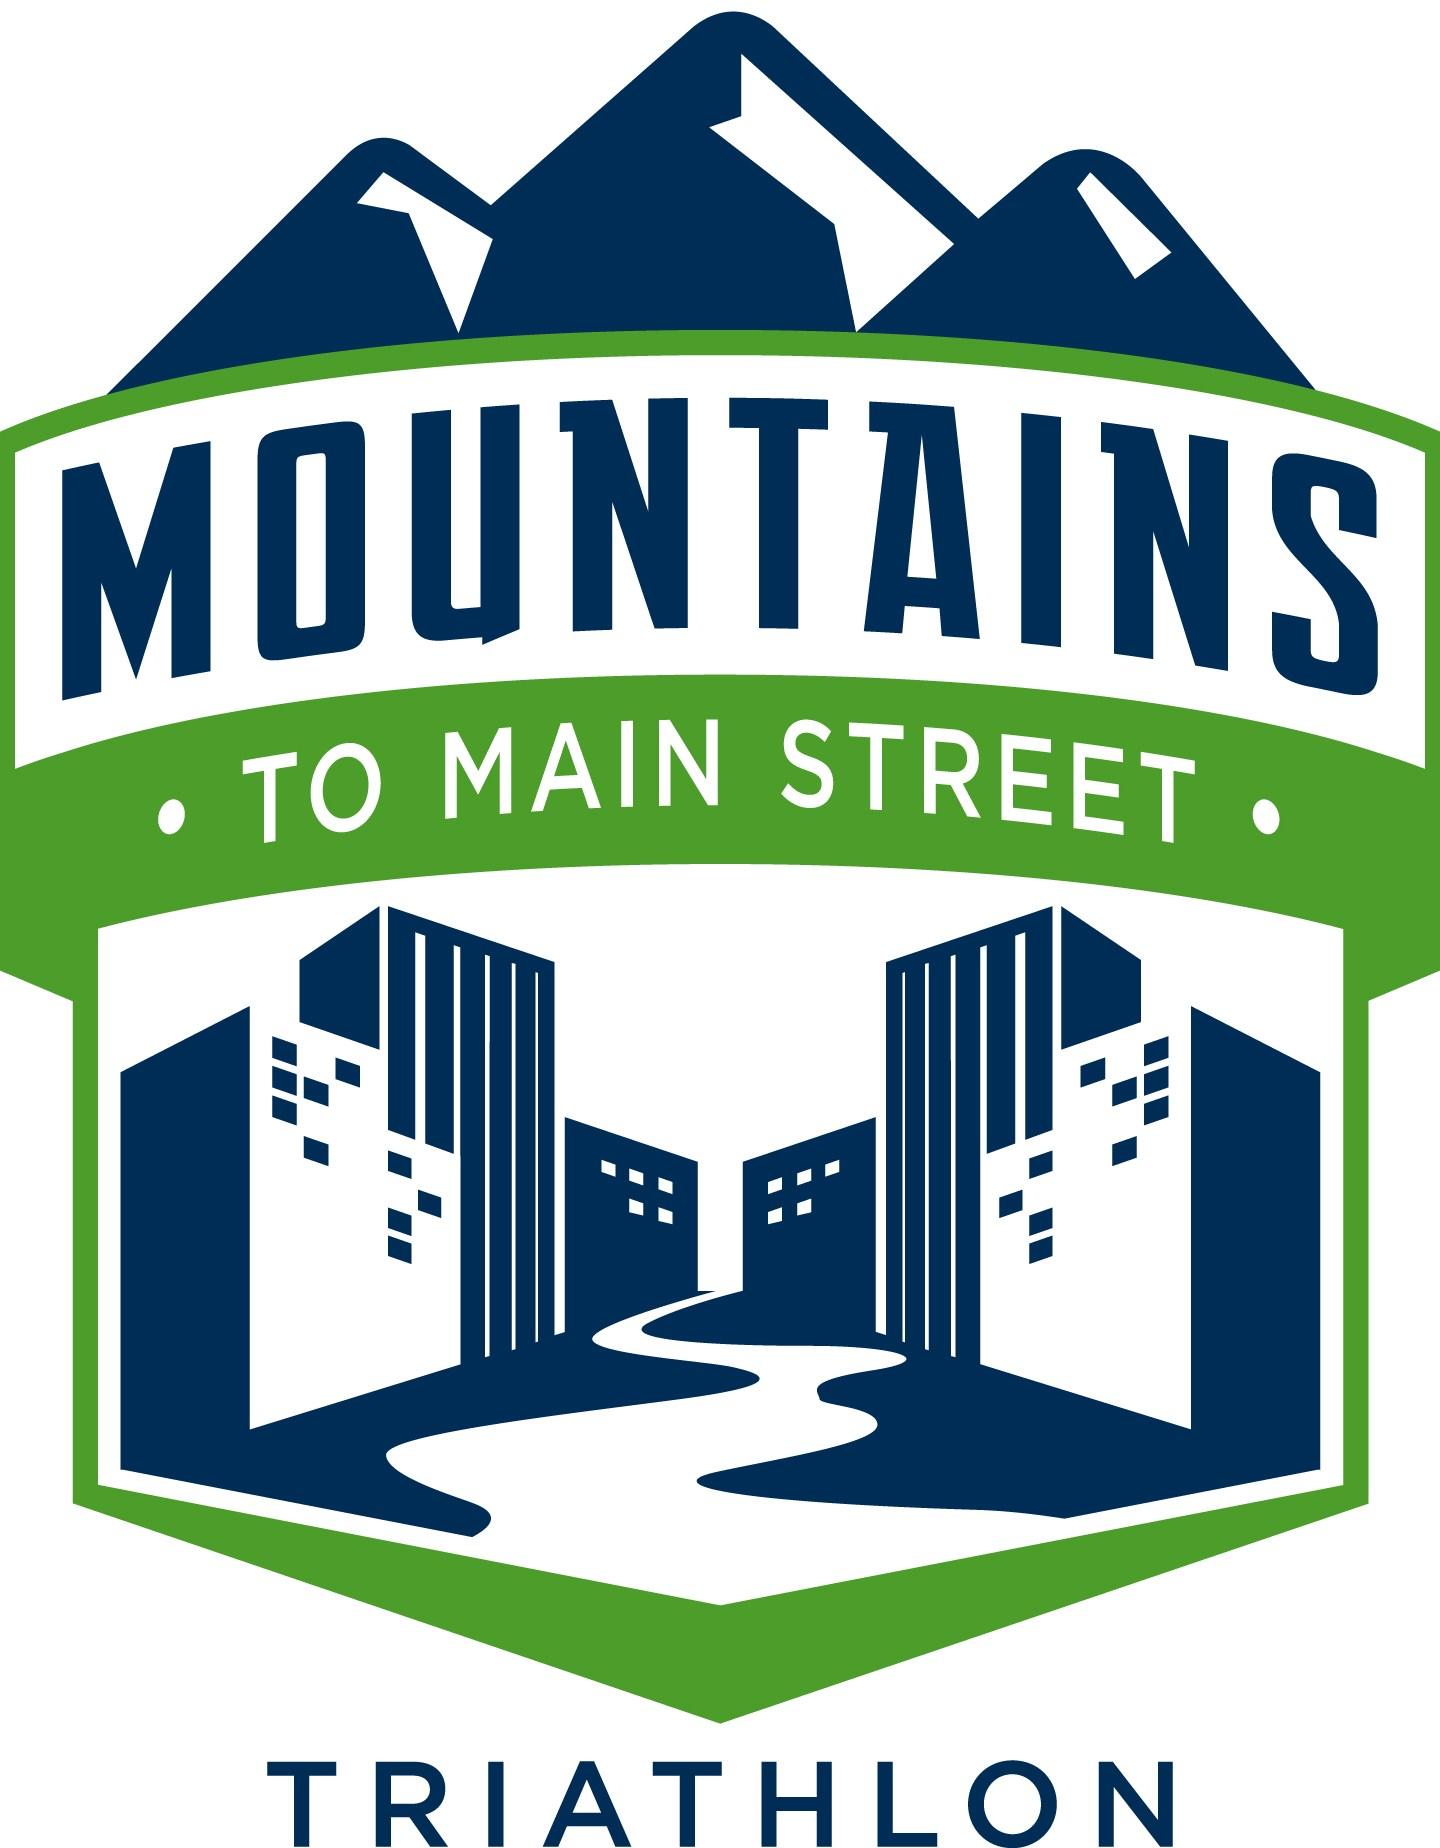 MountainsToMainStreet_Logo_Pantone_Primary-final_1526568811895